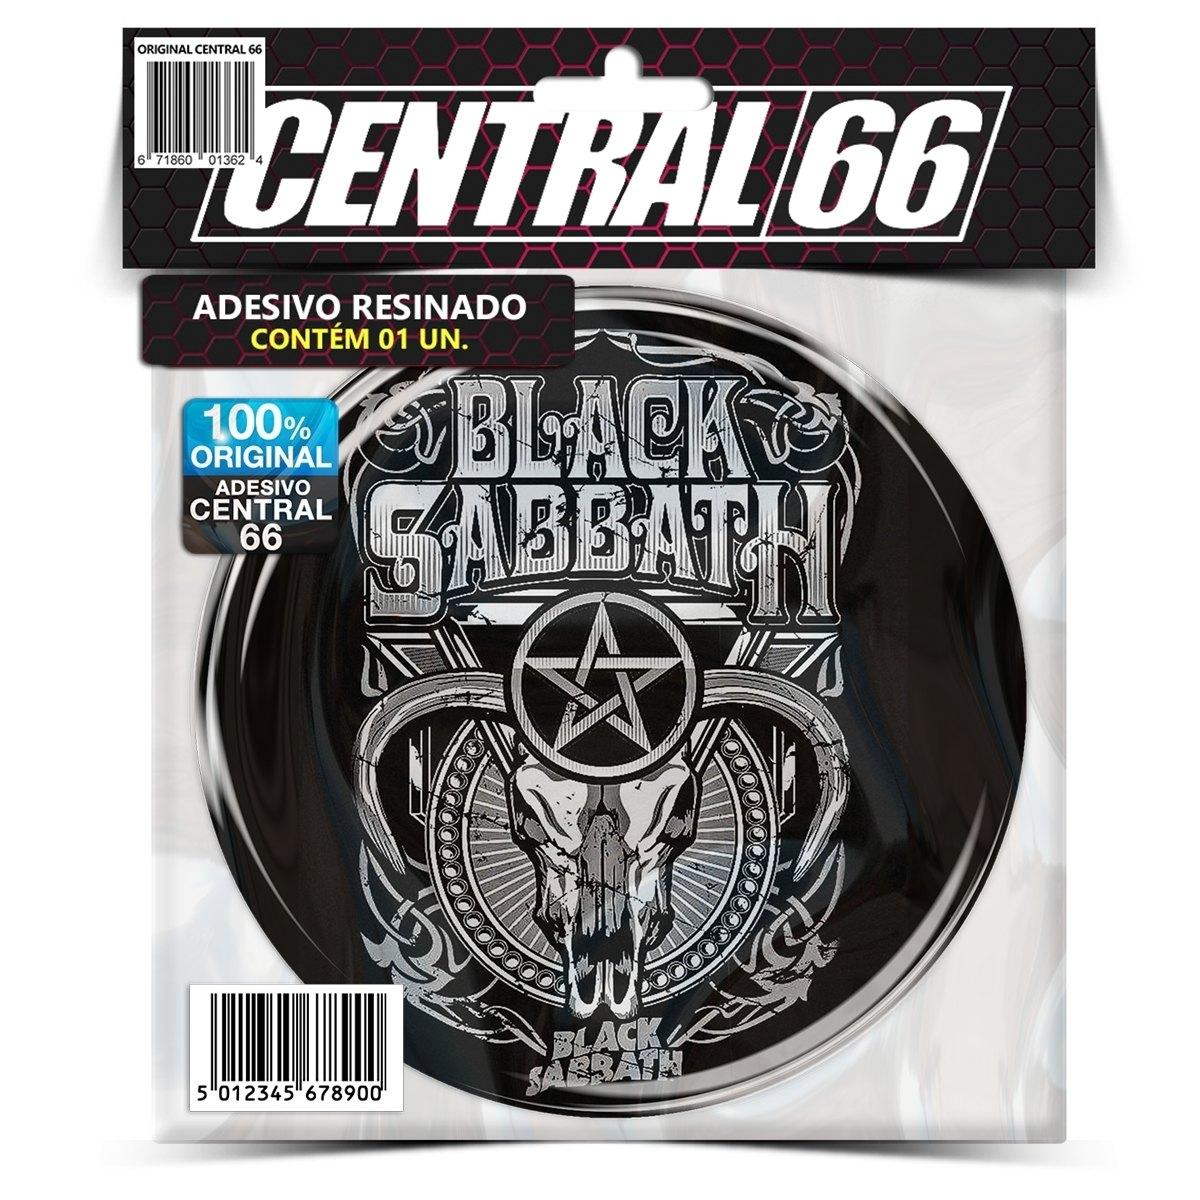 Adesivo Redondo Black Sabbath M03 – Central 66